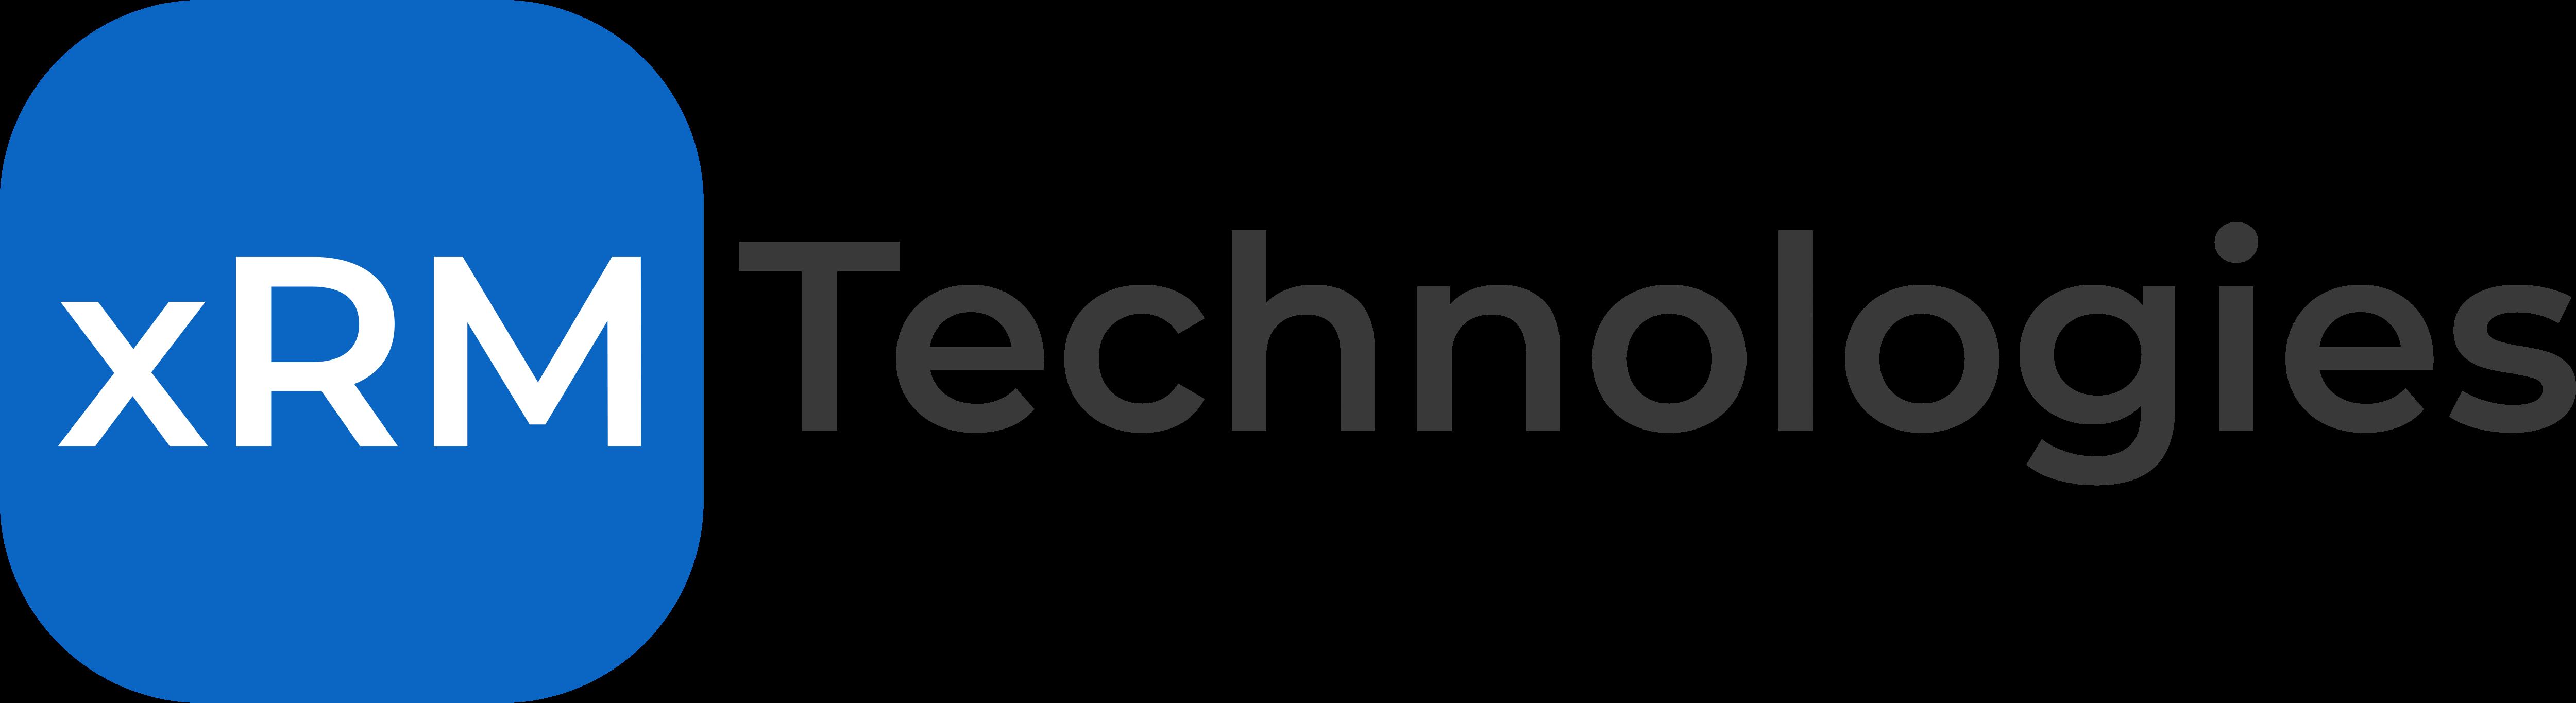 xRM Technologies